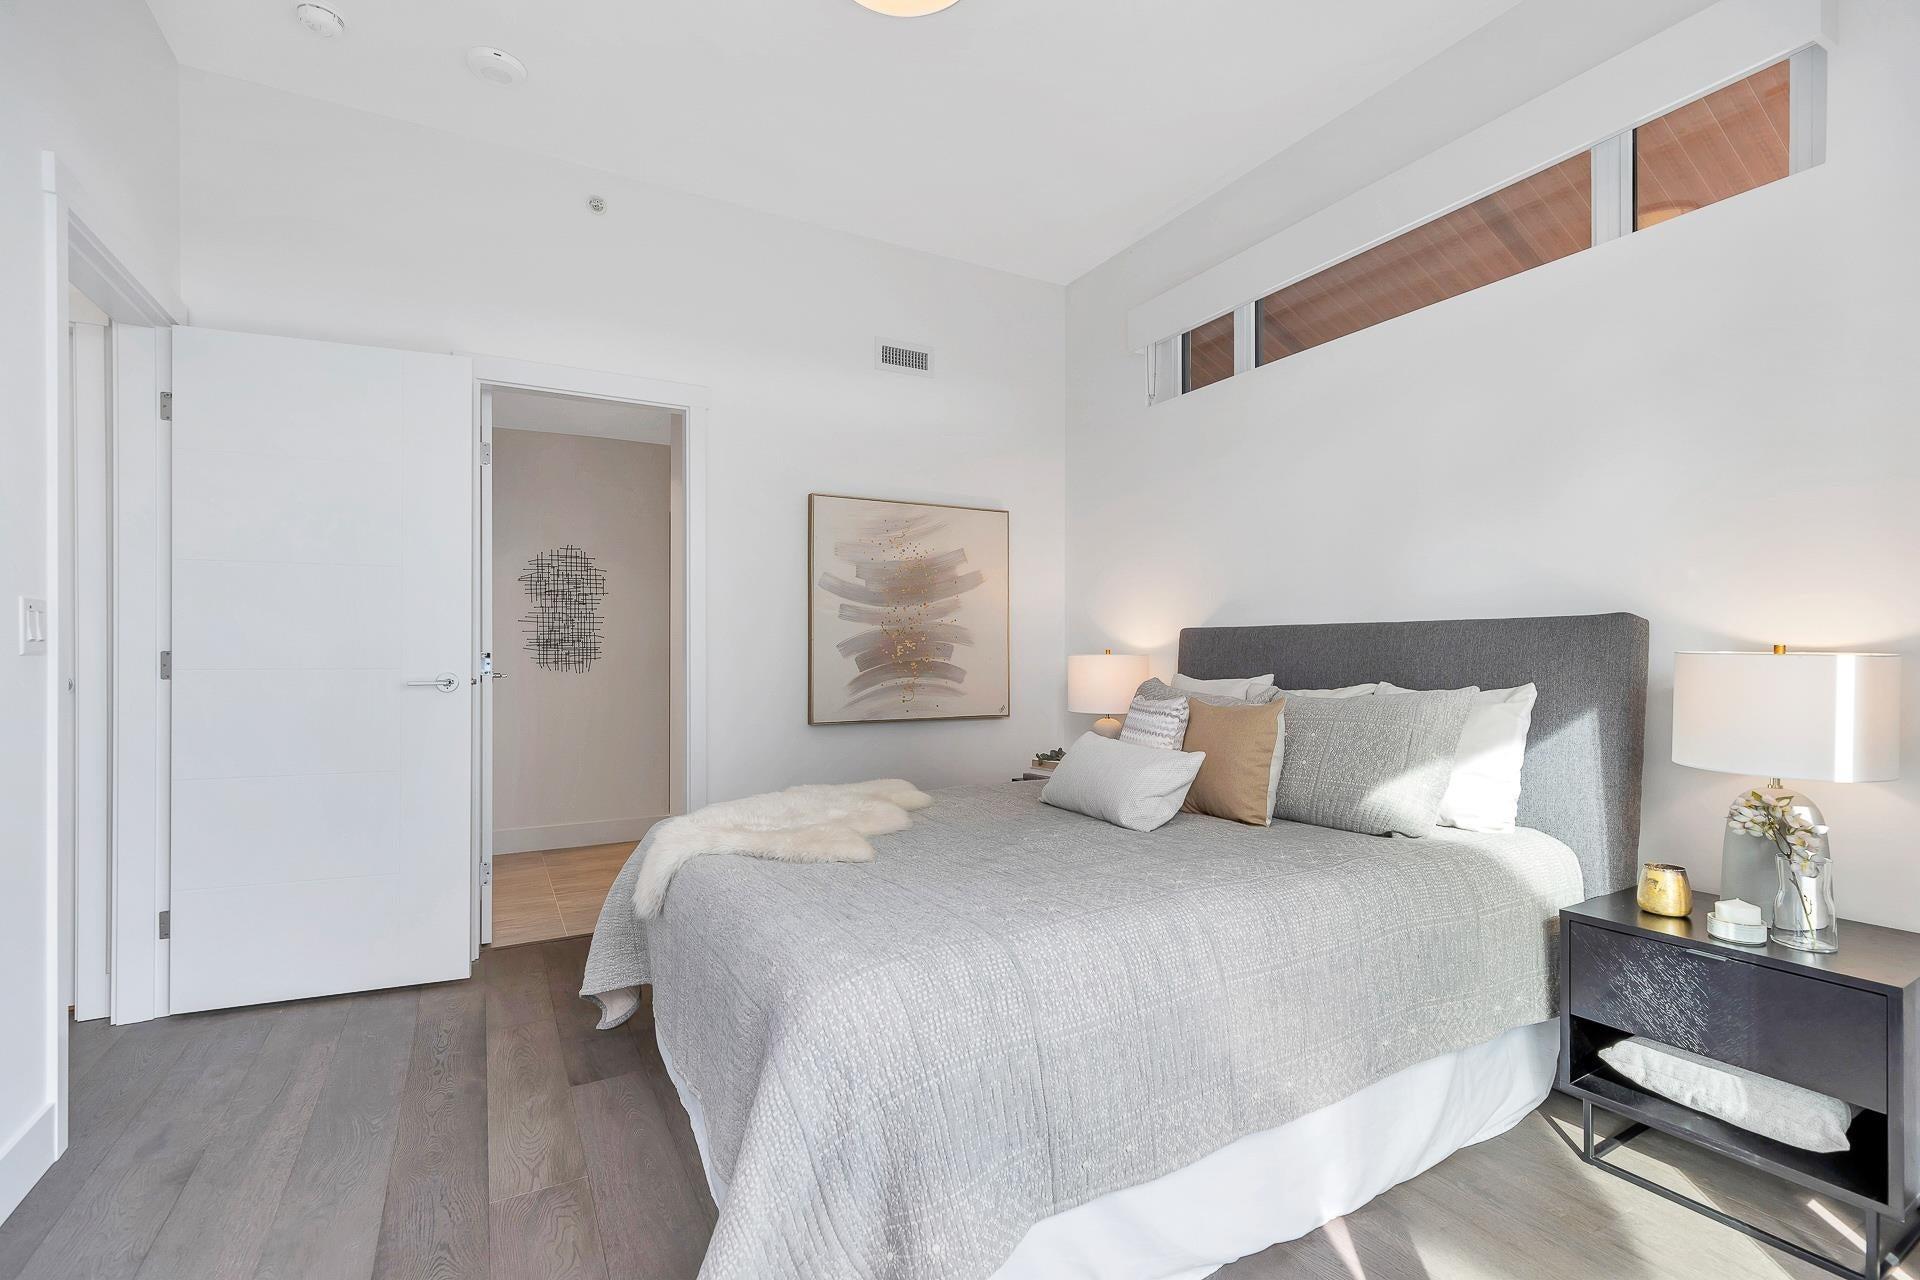 702 2780 VALLEY CENTRE AVENUE - Lynn Valley Apartment/Condo for sale, 3 Bedrooms (R2622279) - #15